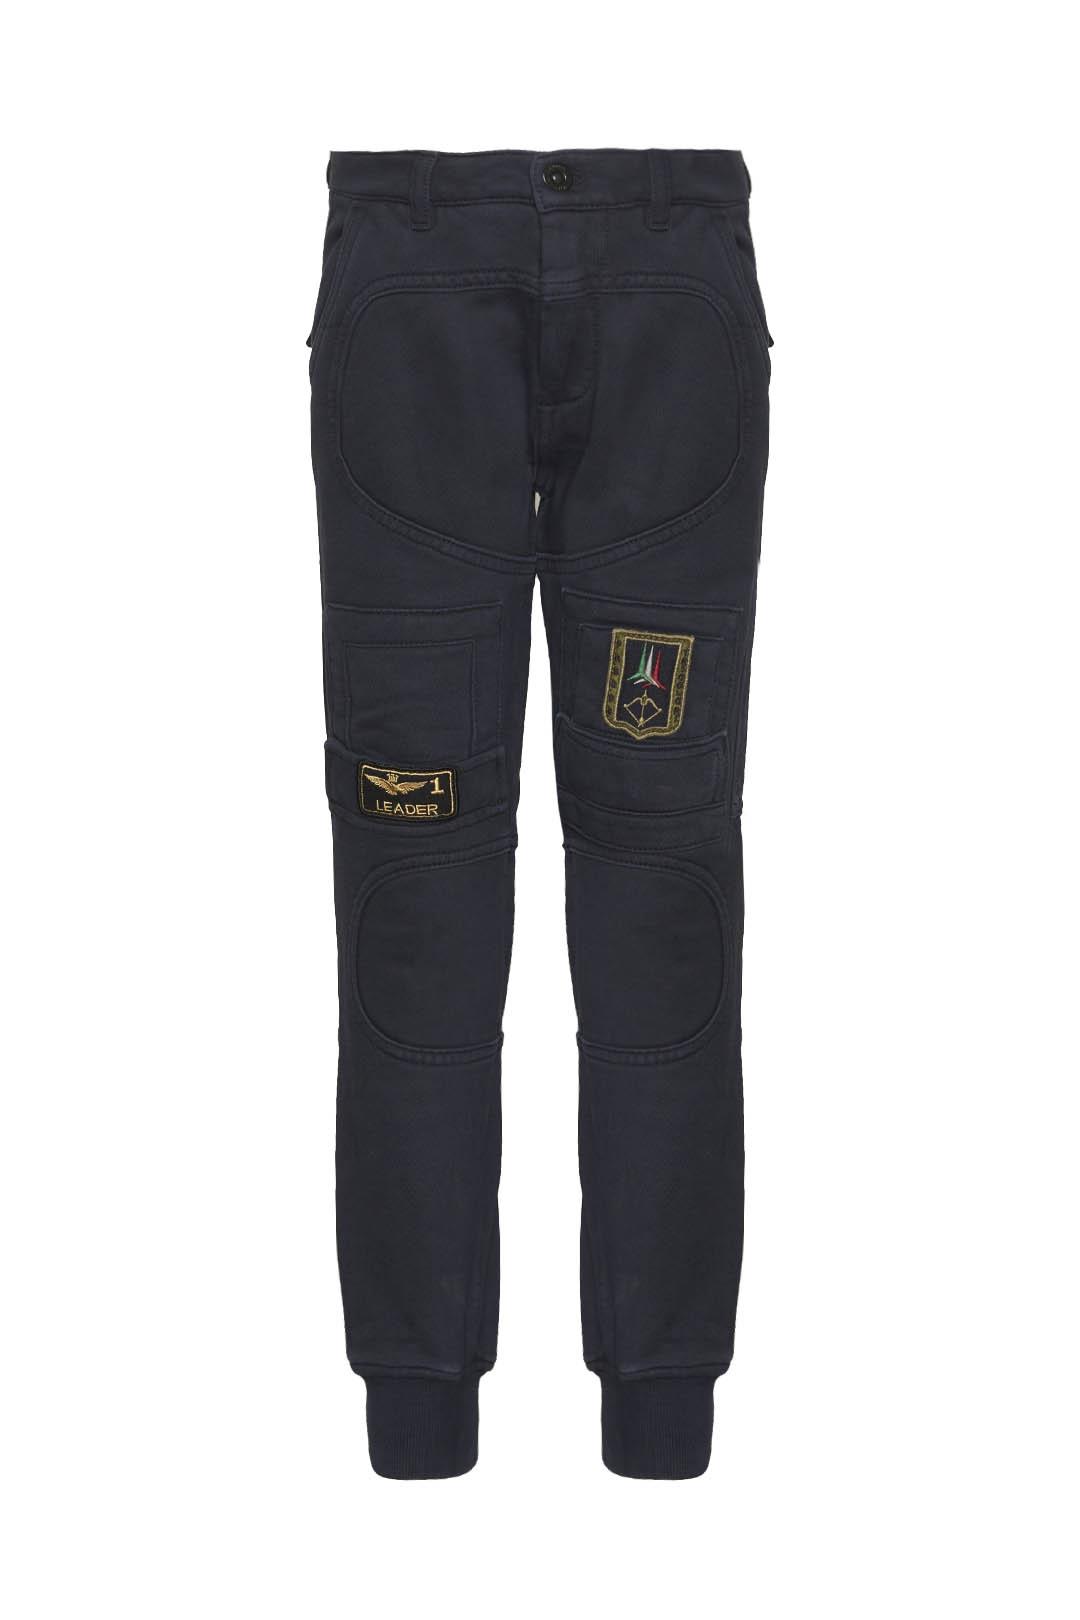 Pantalone Anti-G in felpa di cotone      1